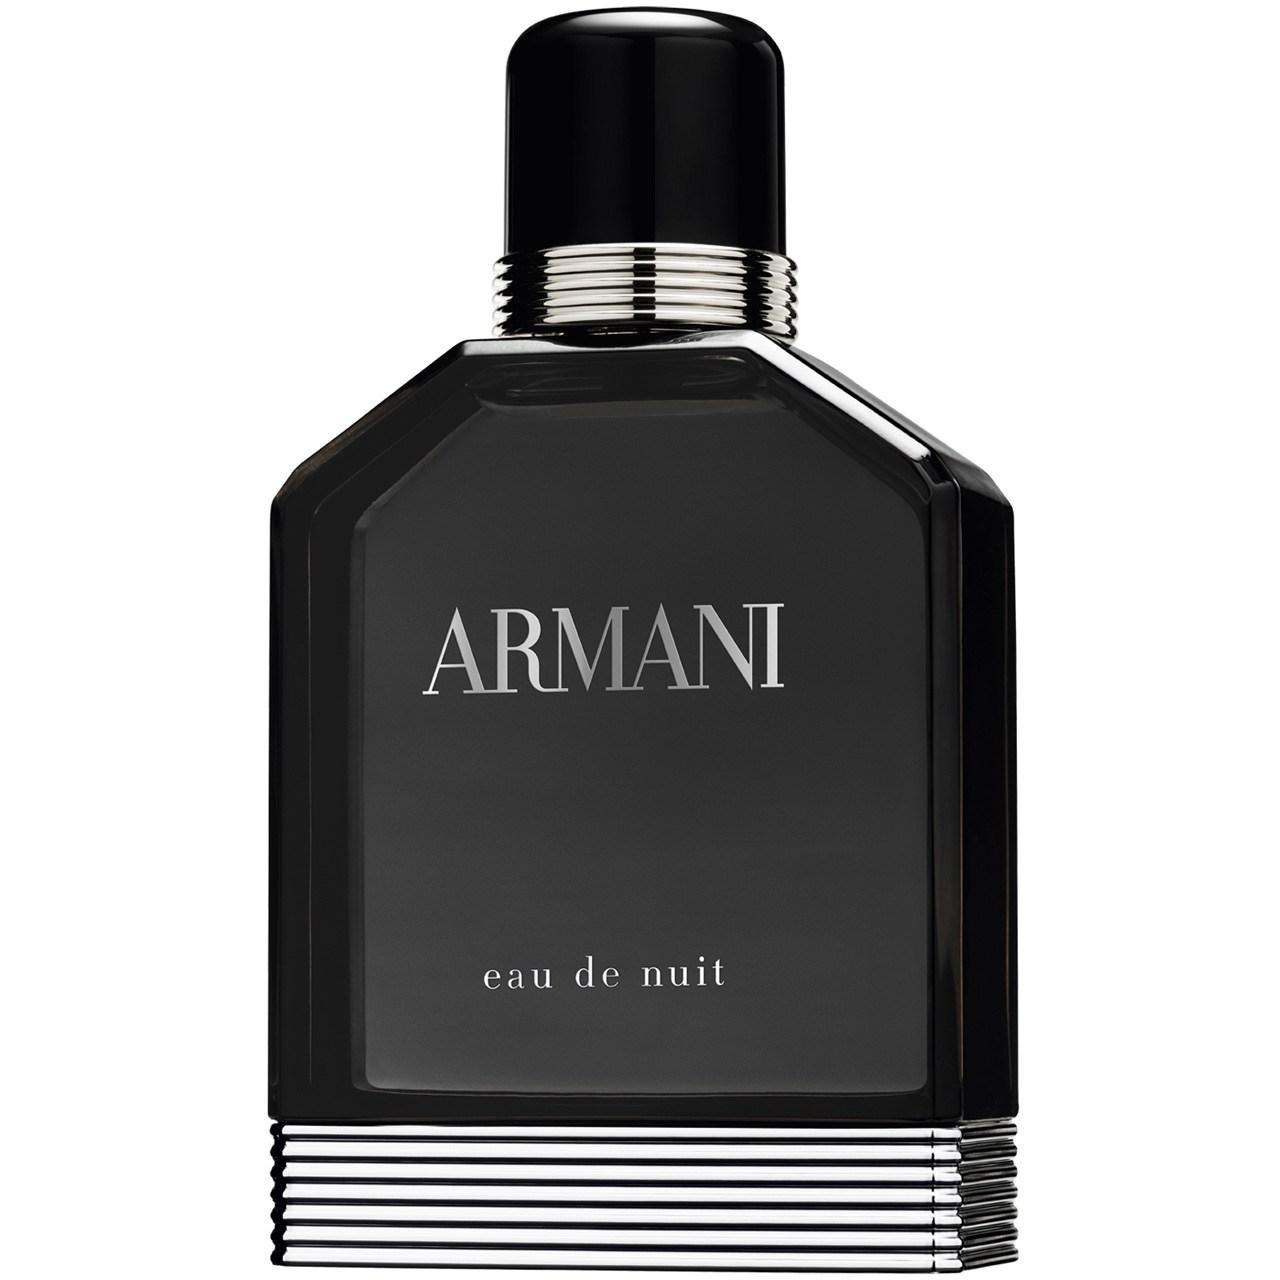 ادو تویلت مردانه جورجیو آرمانی مدل Eau De Nuit حجم 100 میلی لیتر